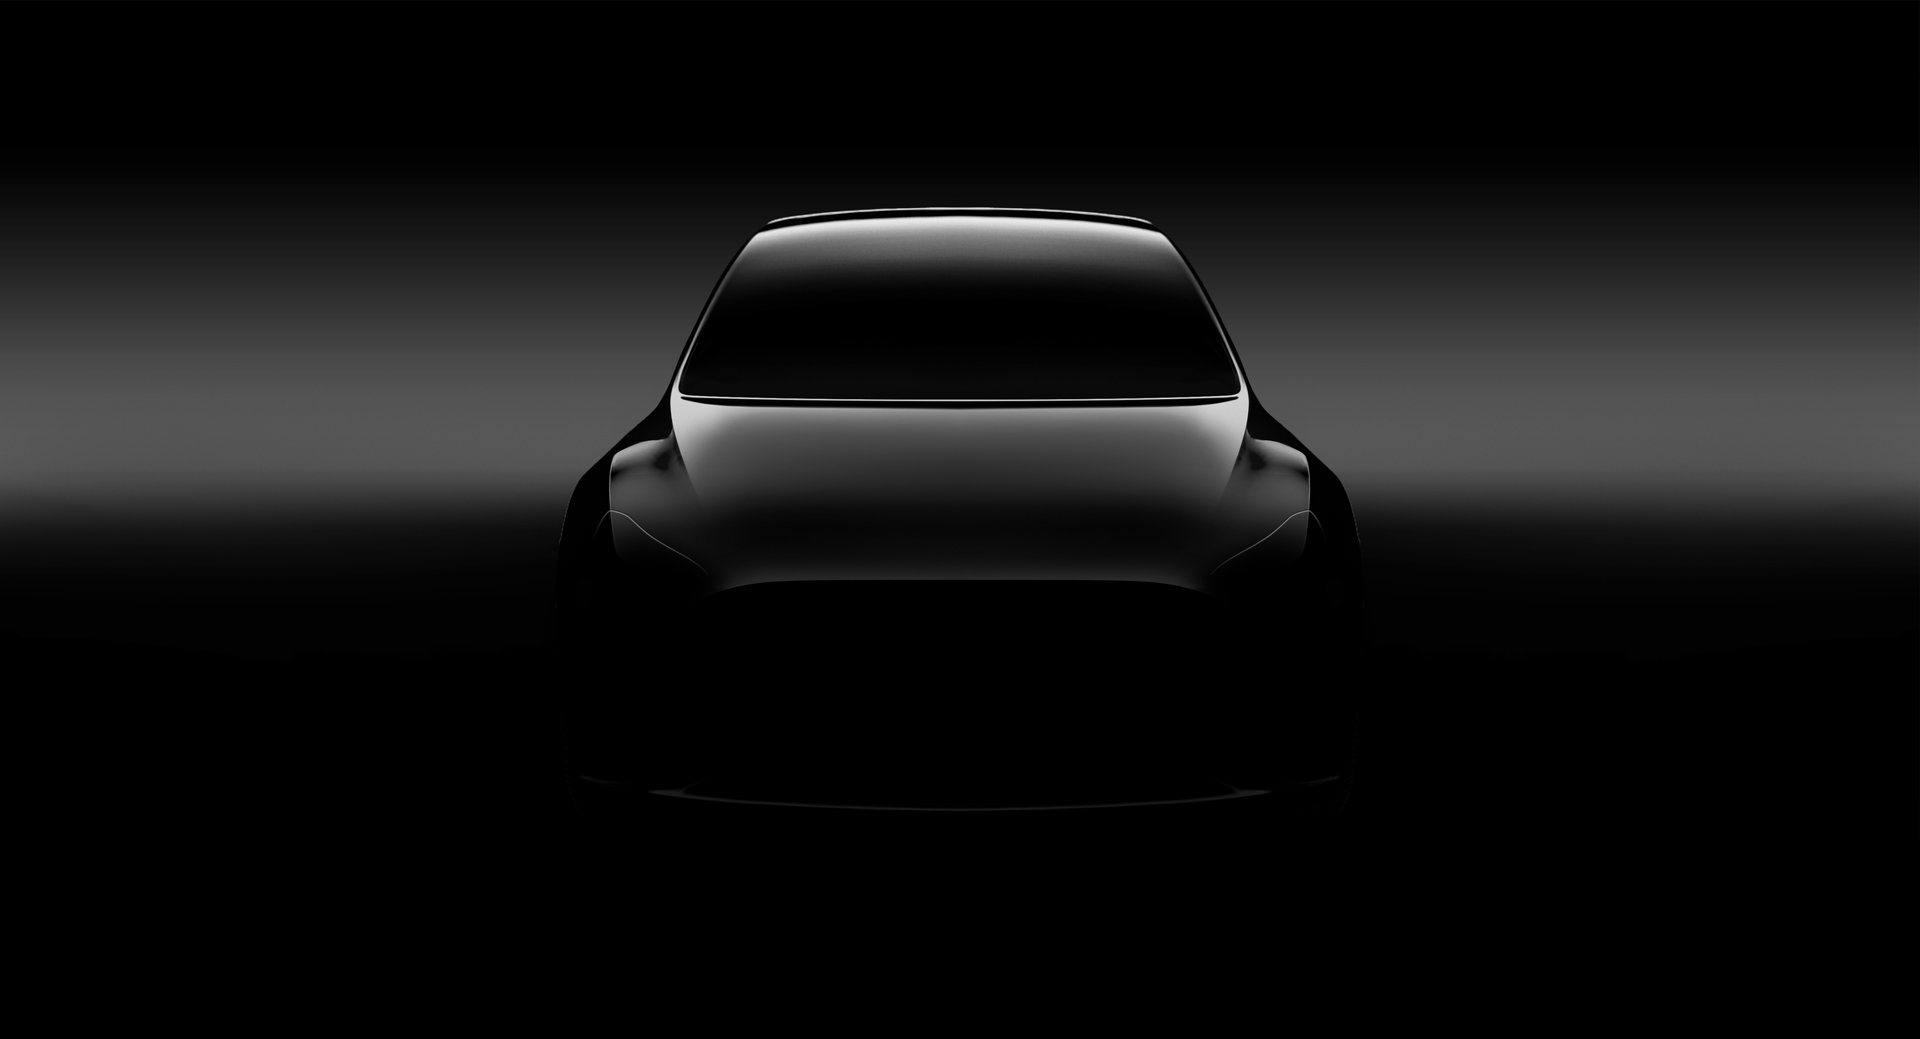 Tesla Model Y ќе биде 10.000 долари поскап од Model 3